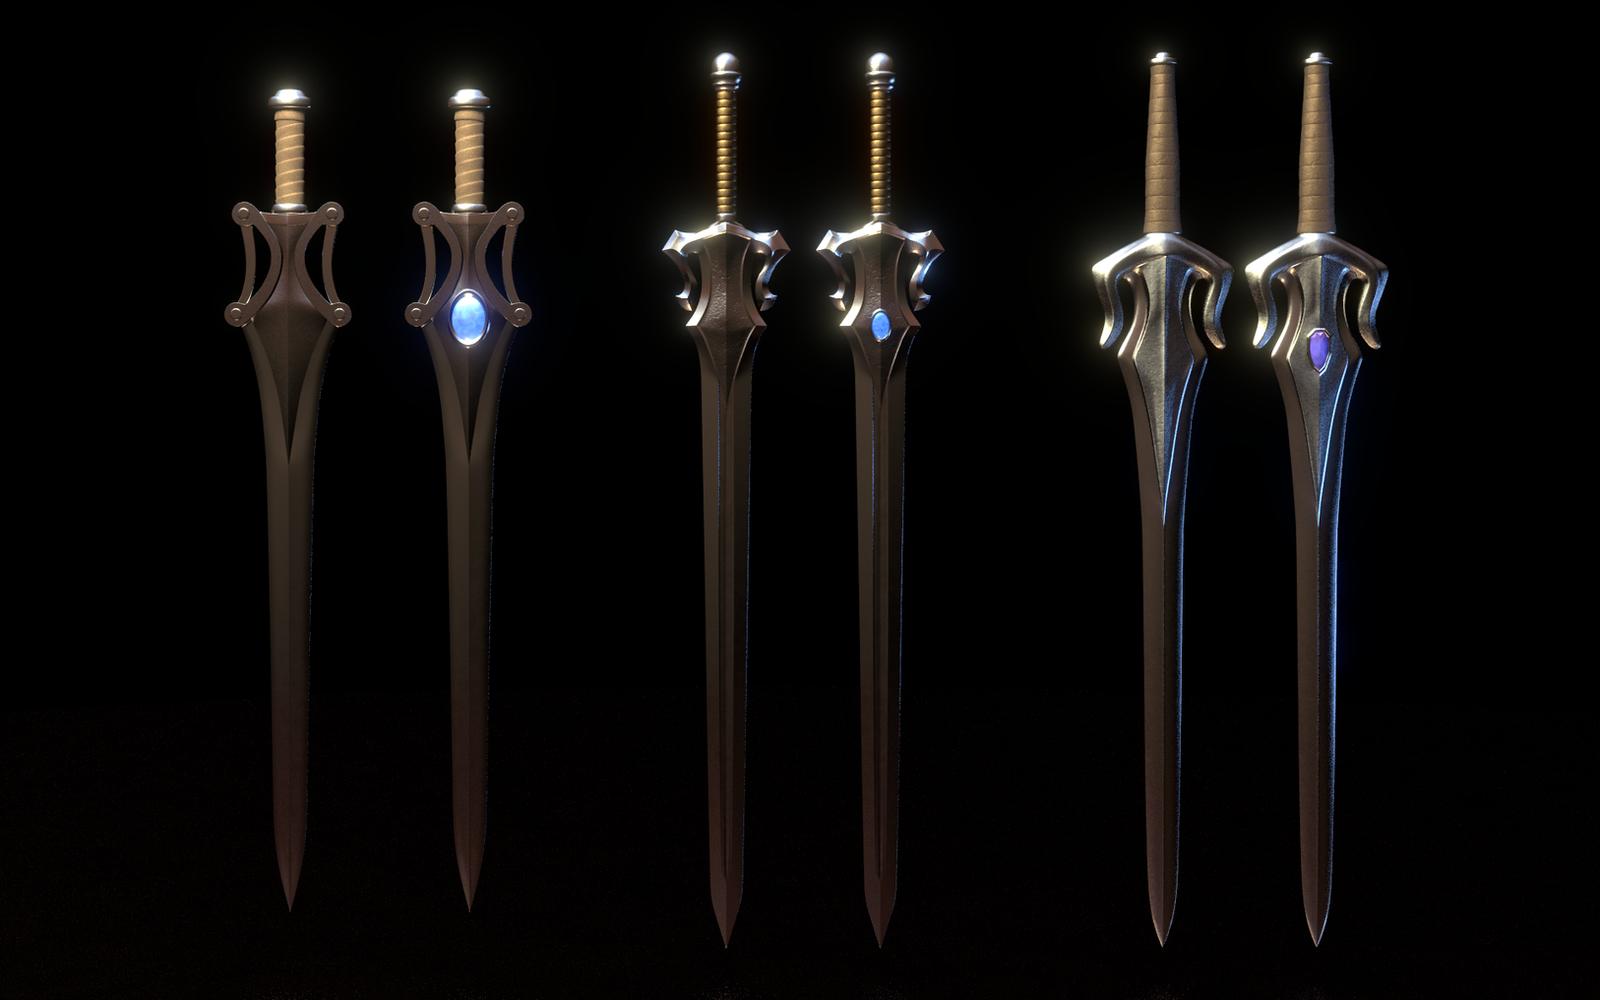 MOTU - Six Swords of Grayskull by paulrich